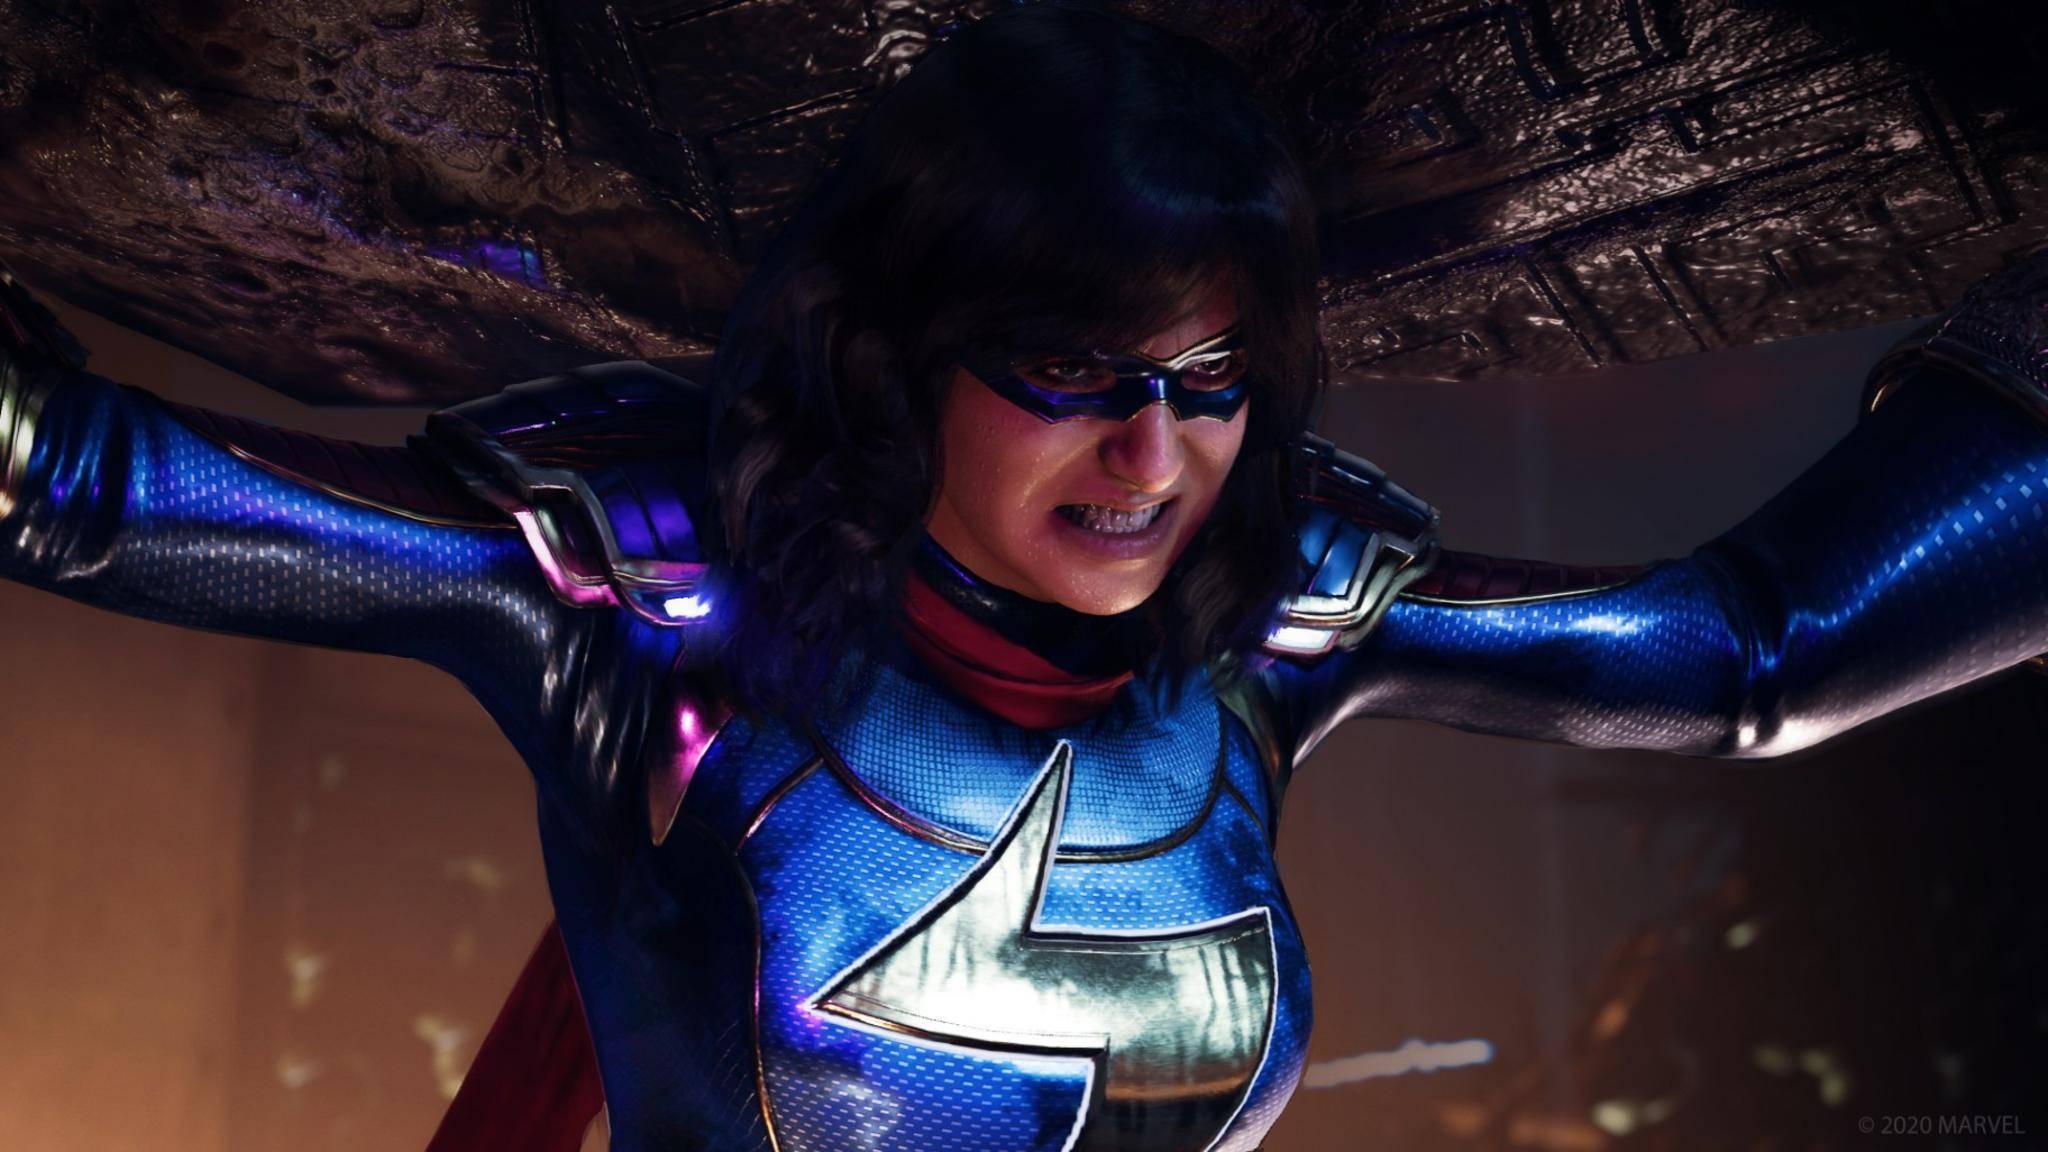 marvels-avengers-kamala-screenshot-02